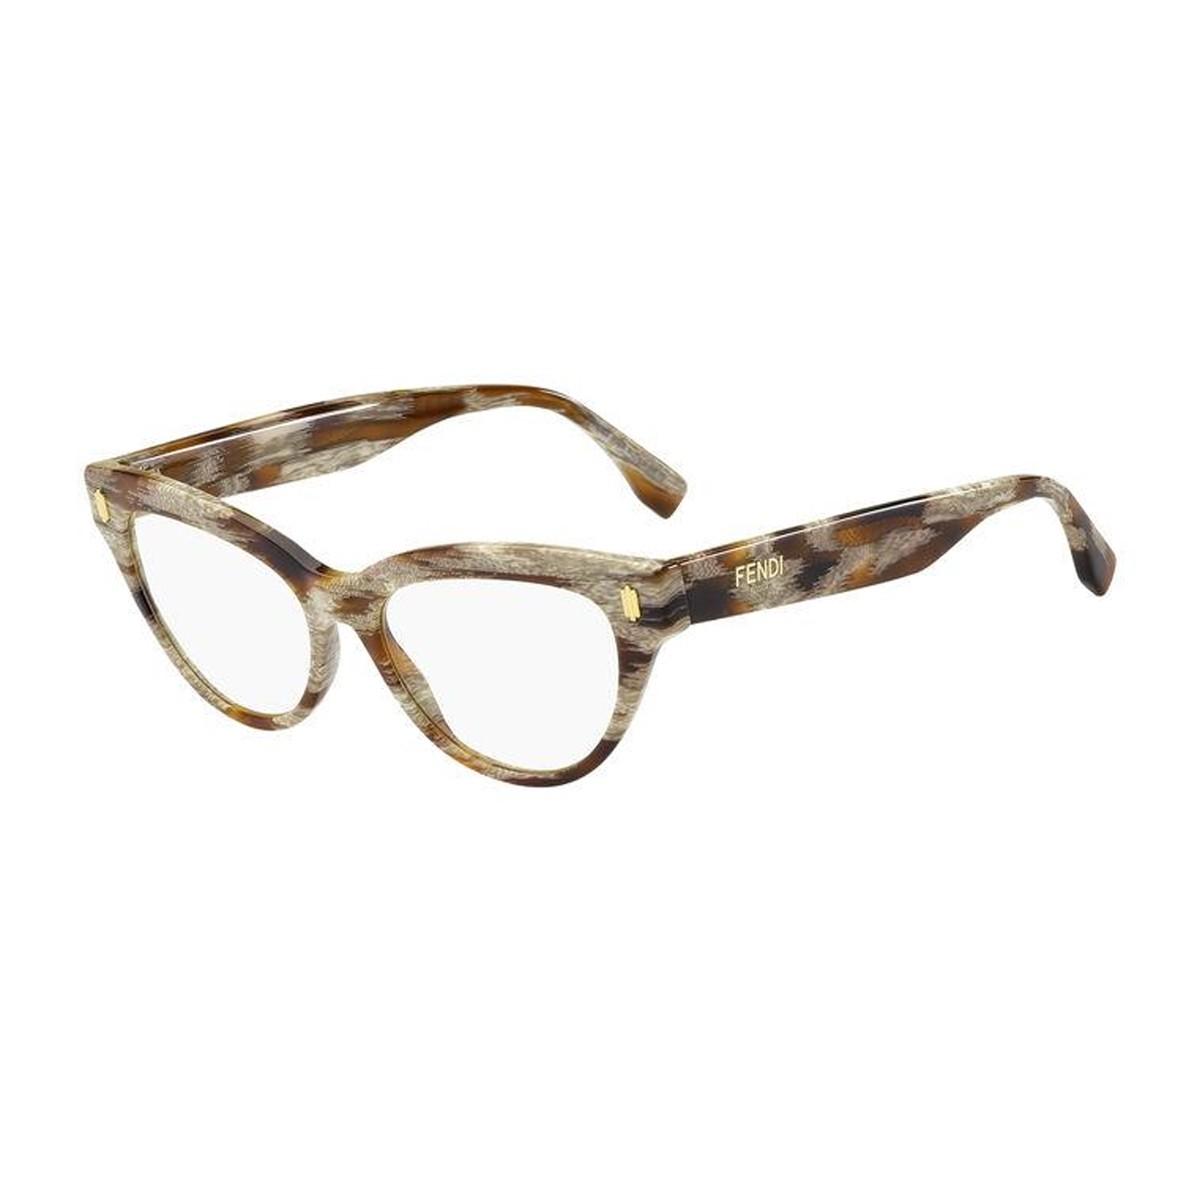 Fendi FF 0443   Women's eyeglasses